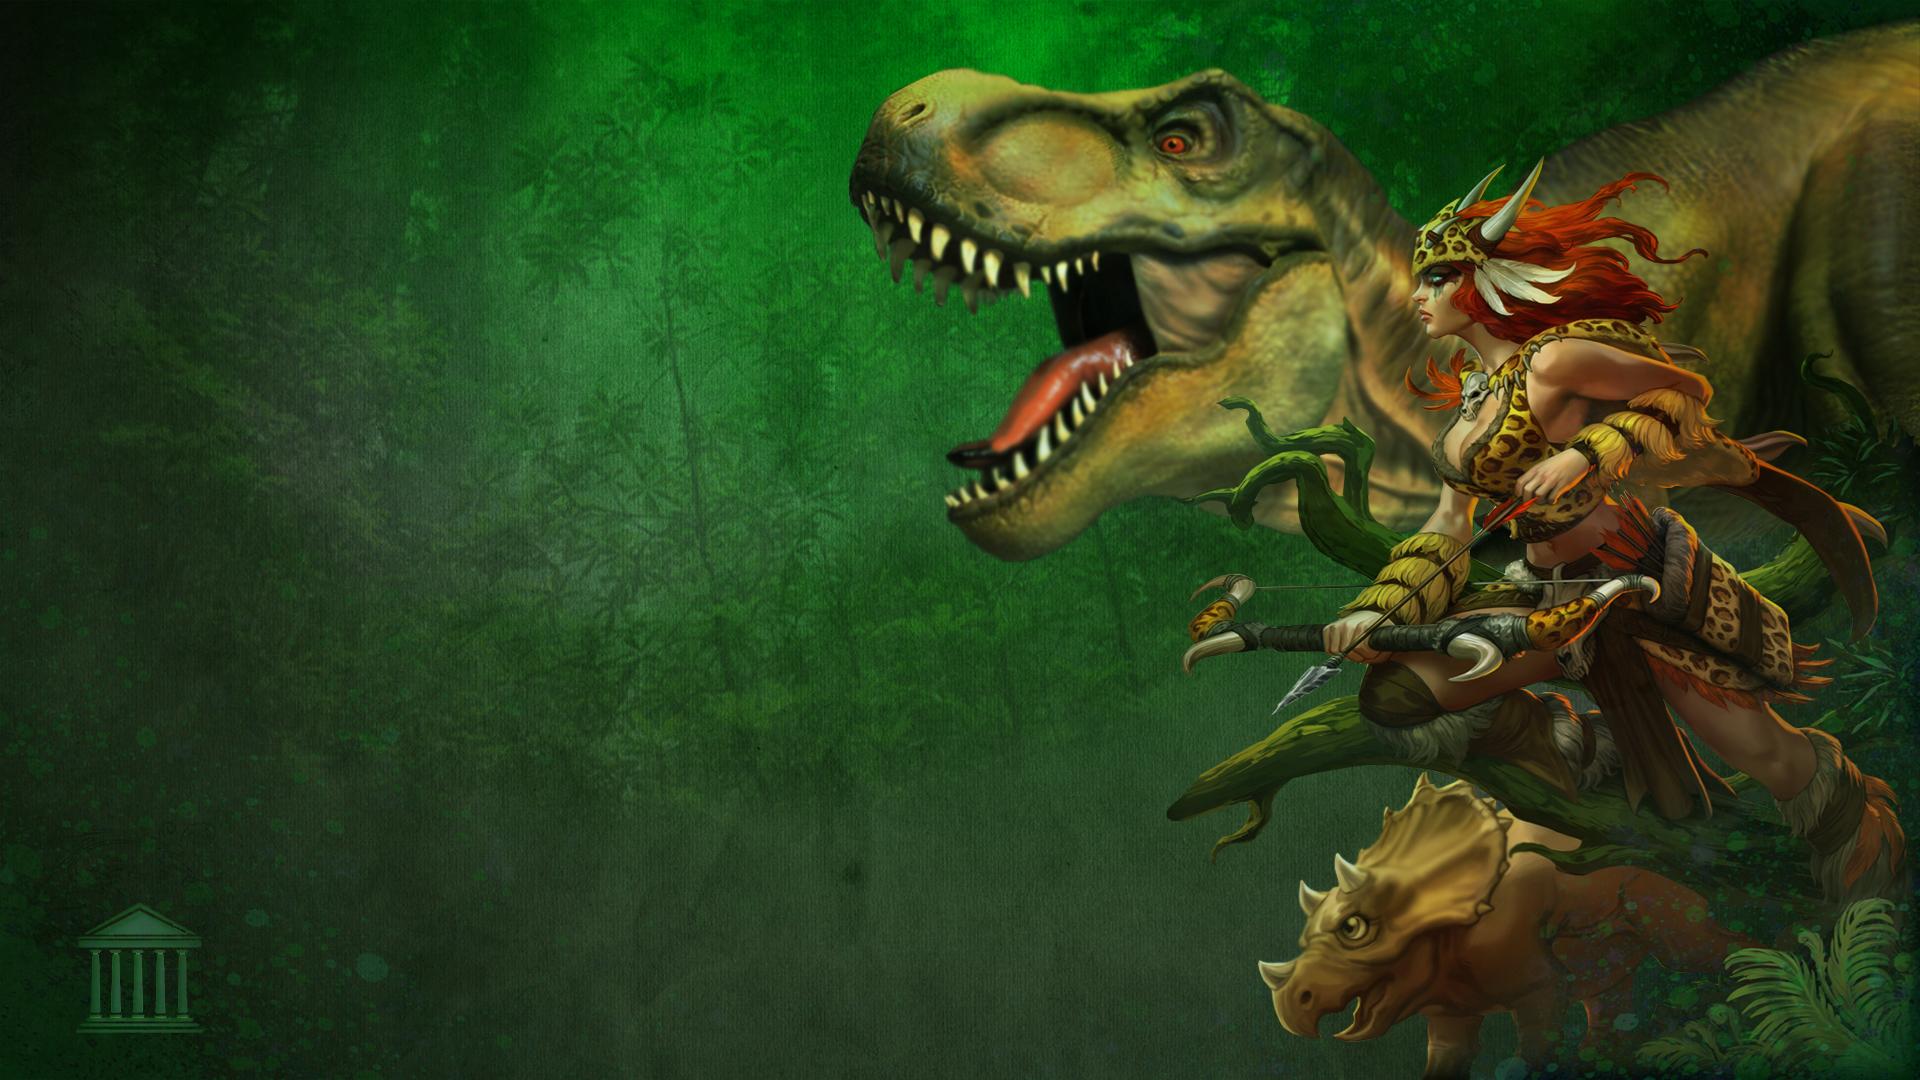 Smite Artemis Wallpaper | www.imgkid.com - The Image Kid ...